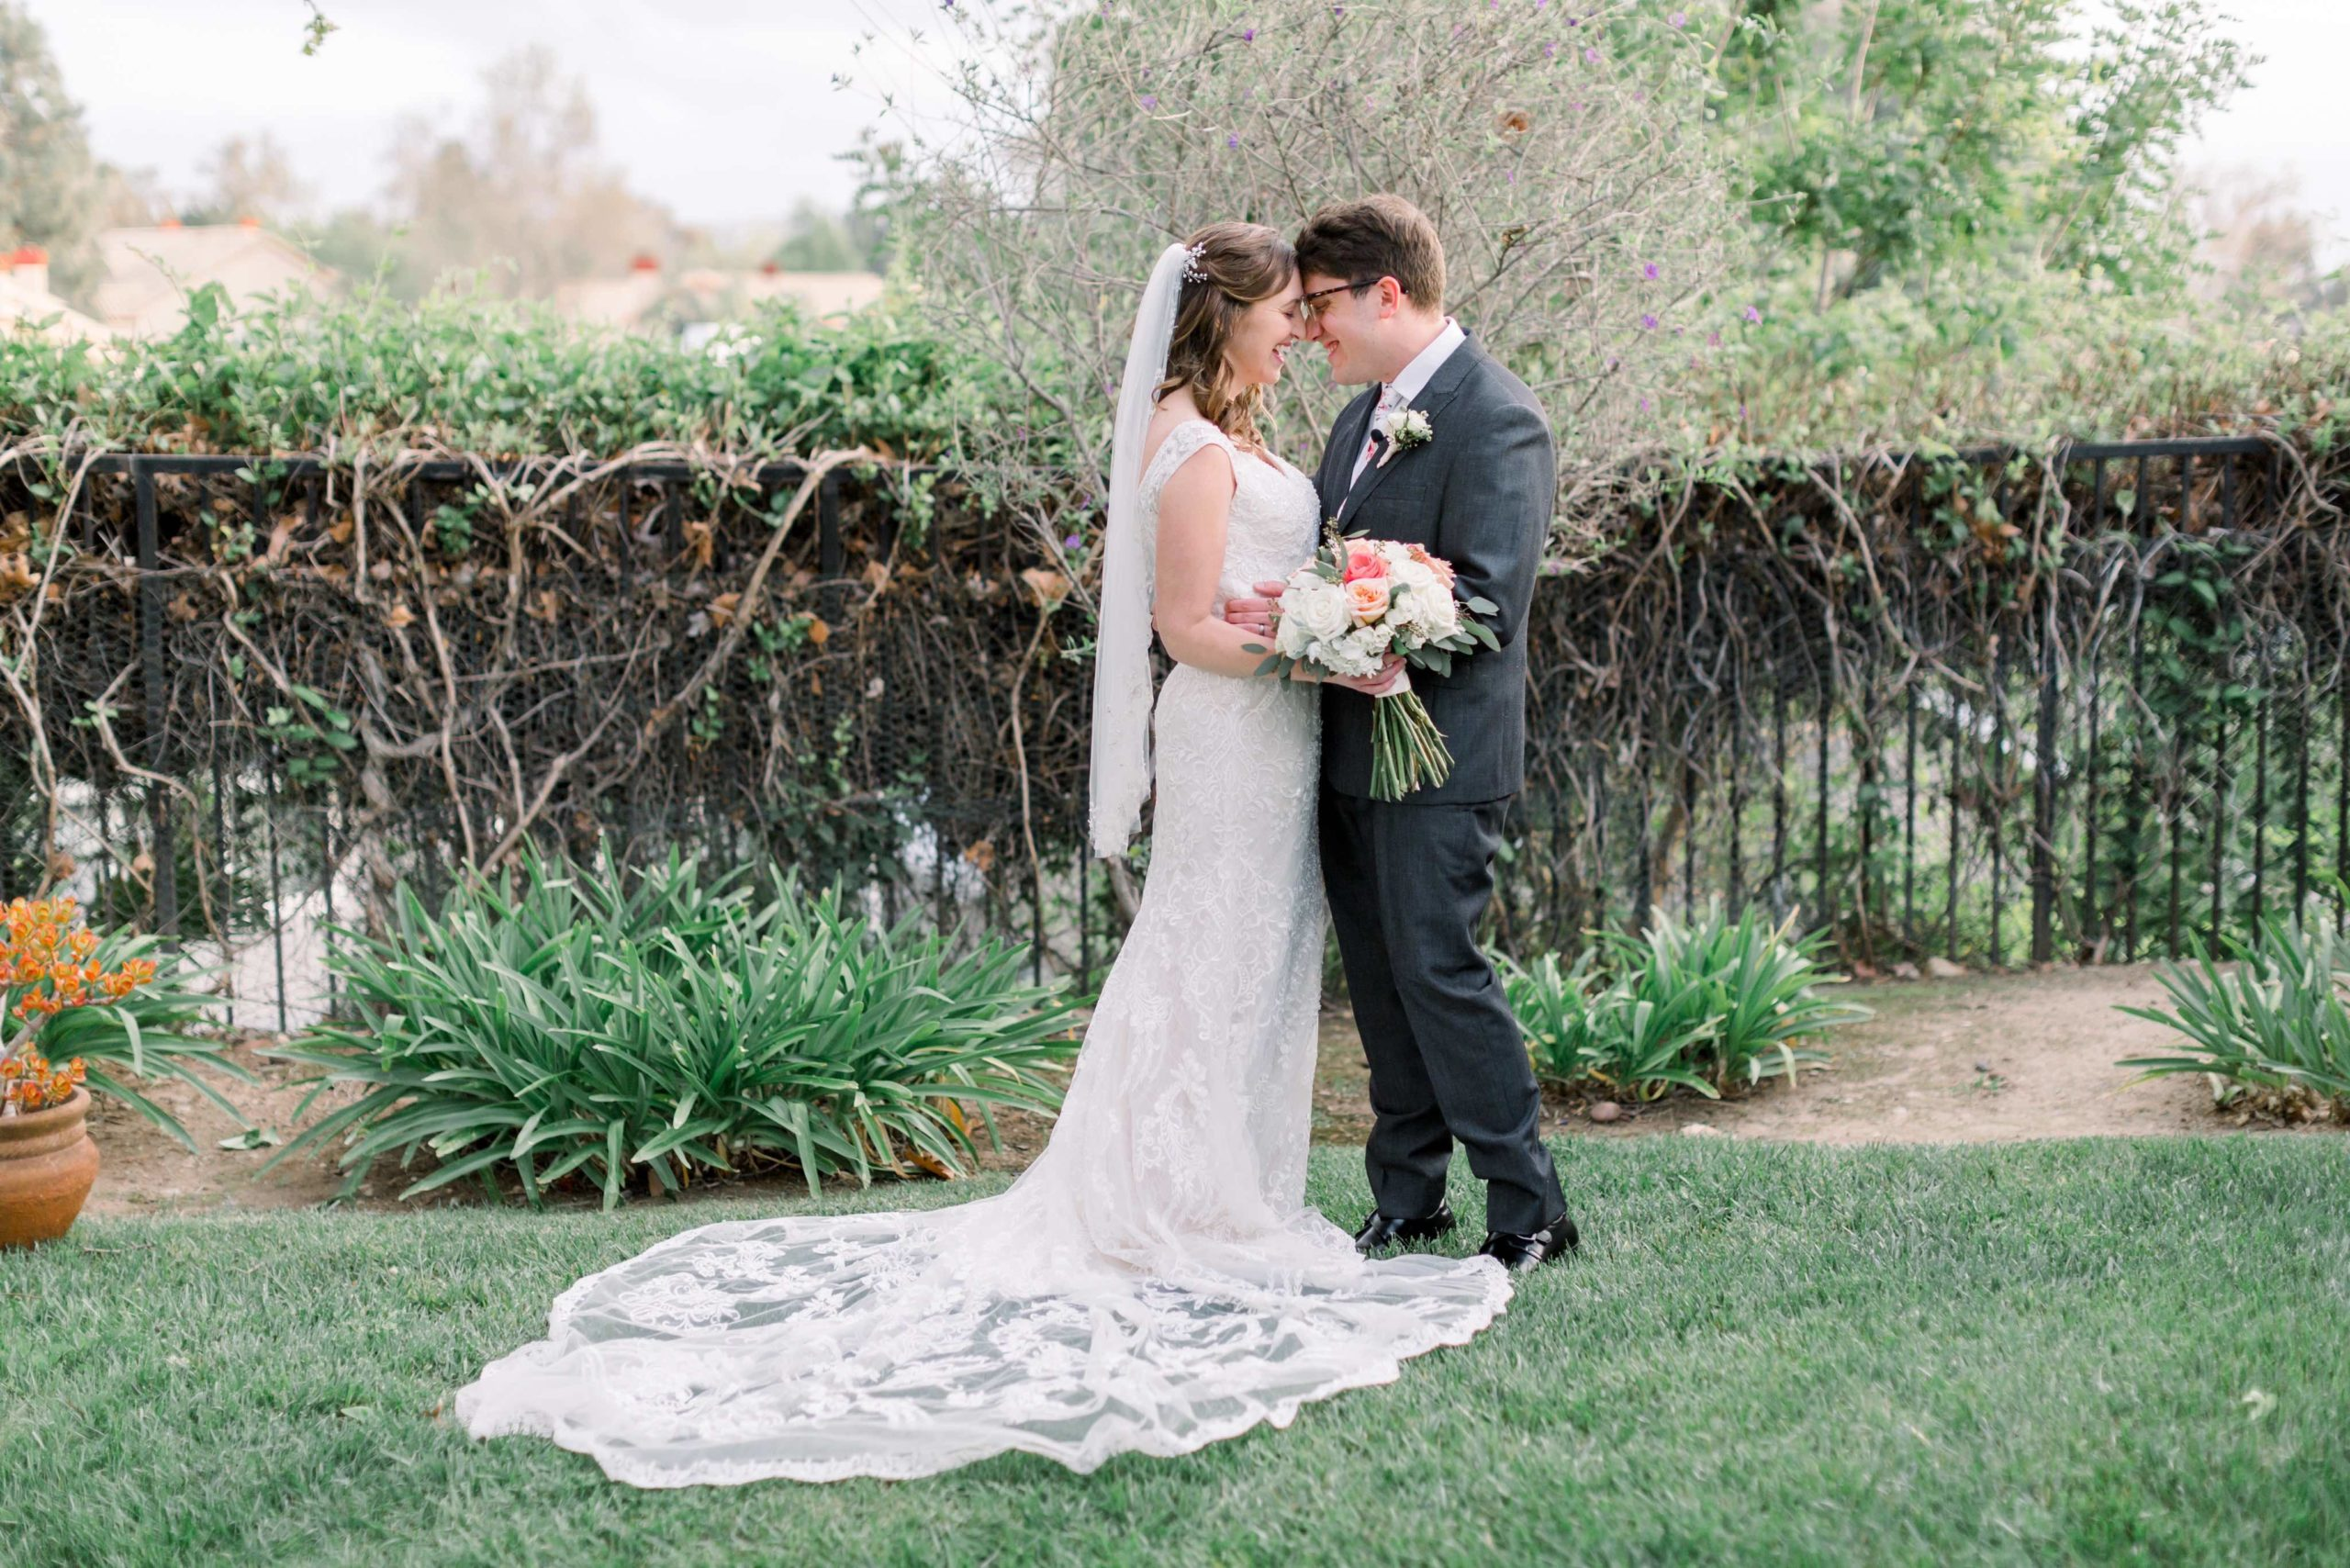 Bride and Groom embracing in backyard wedding